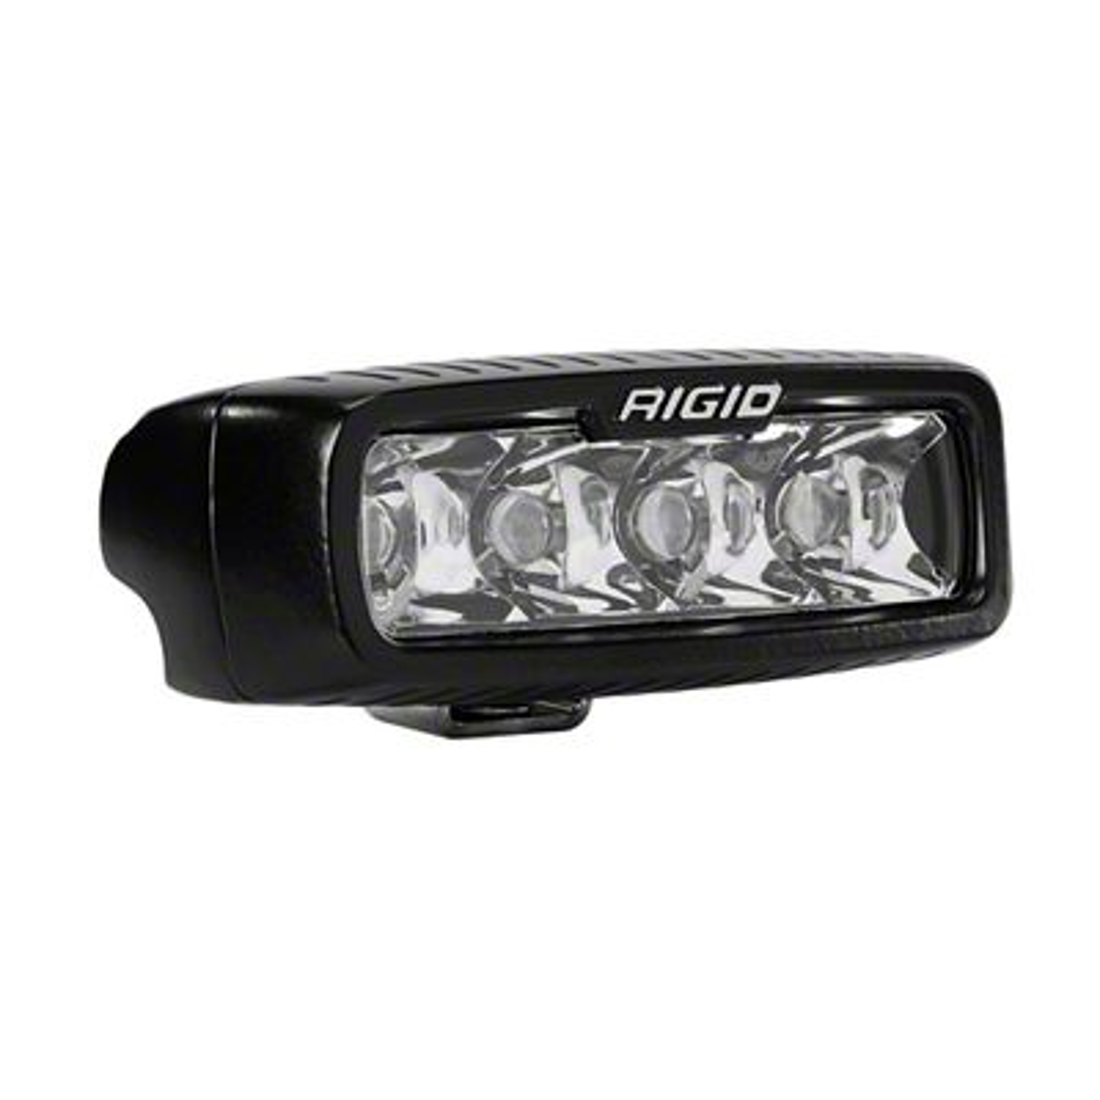 Rigid Industries SR-Q Series Amber LED Light Bar - Spot Beam